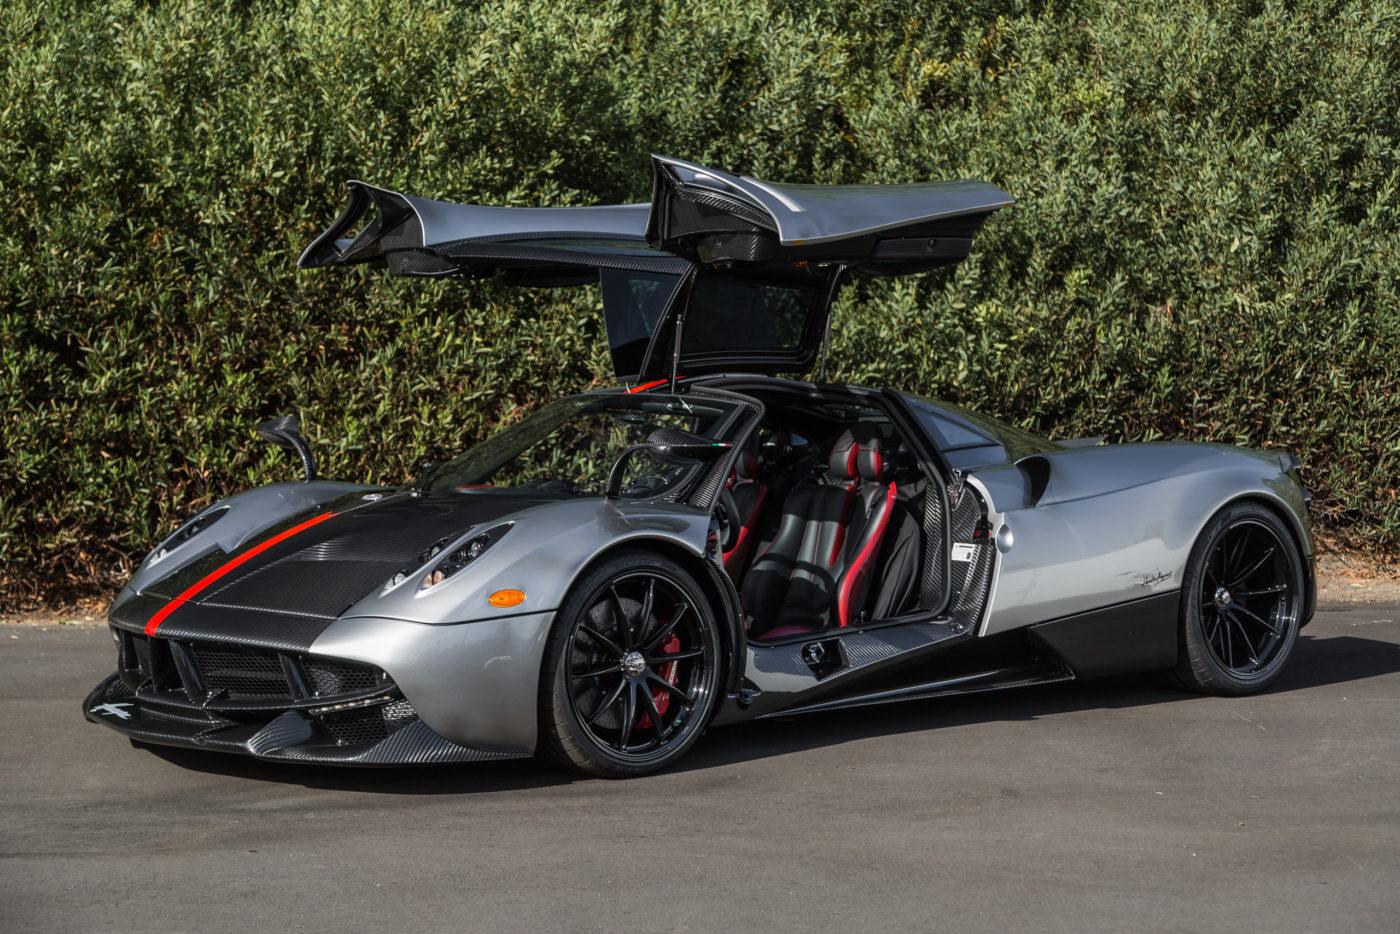 Bugatti Chiron and Pagani Huayra Bought With Bitcoin